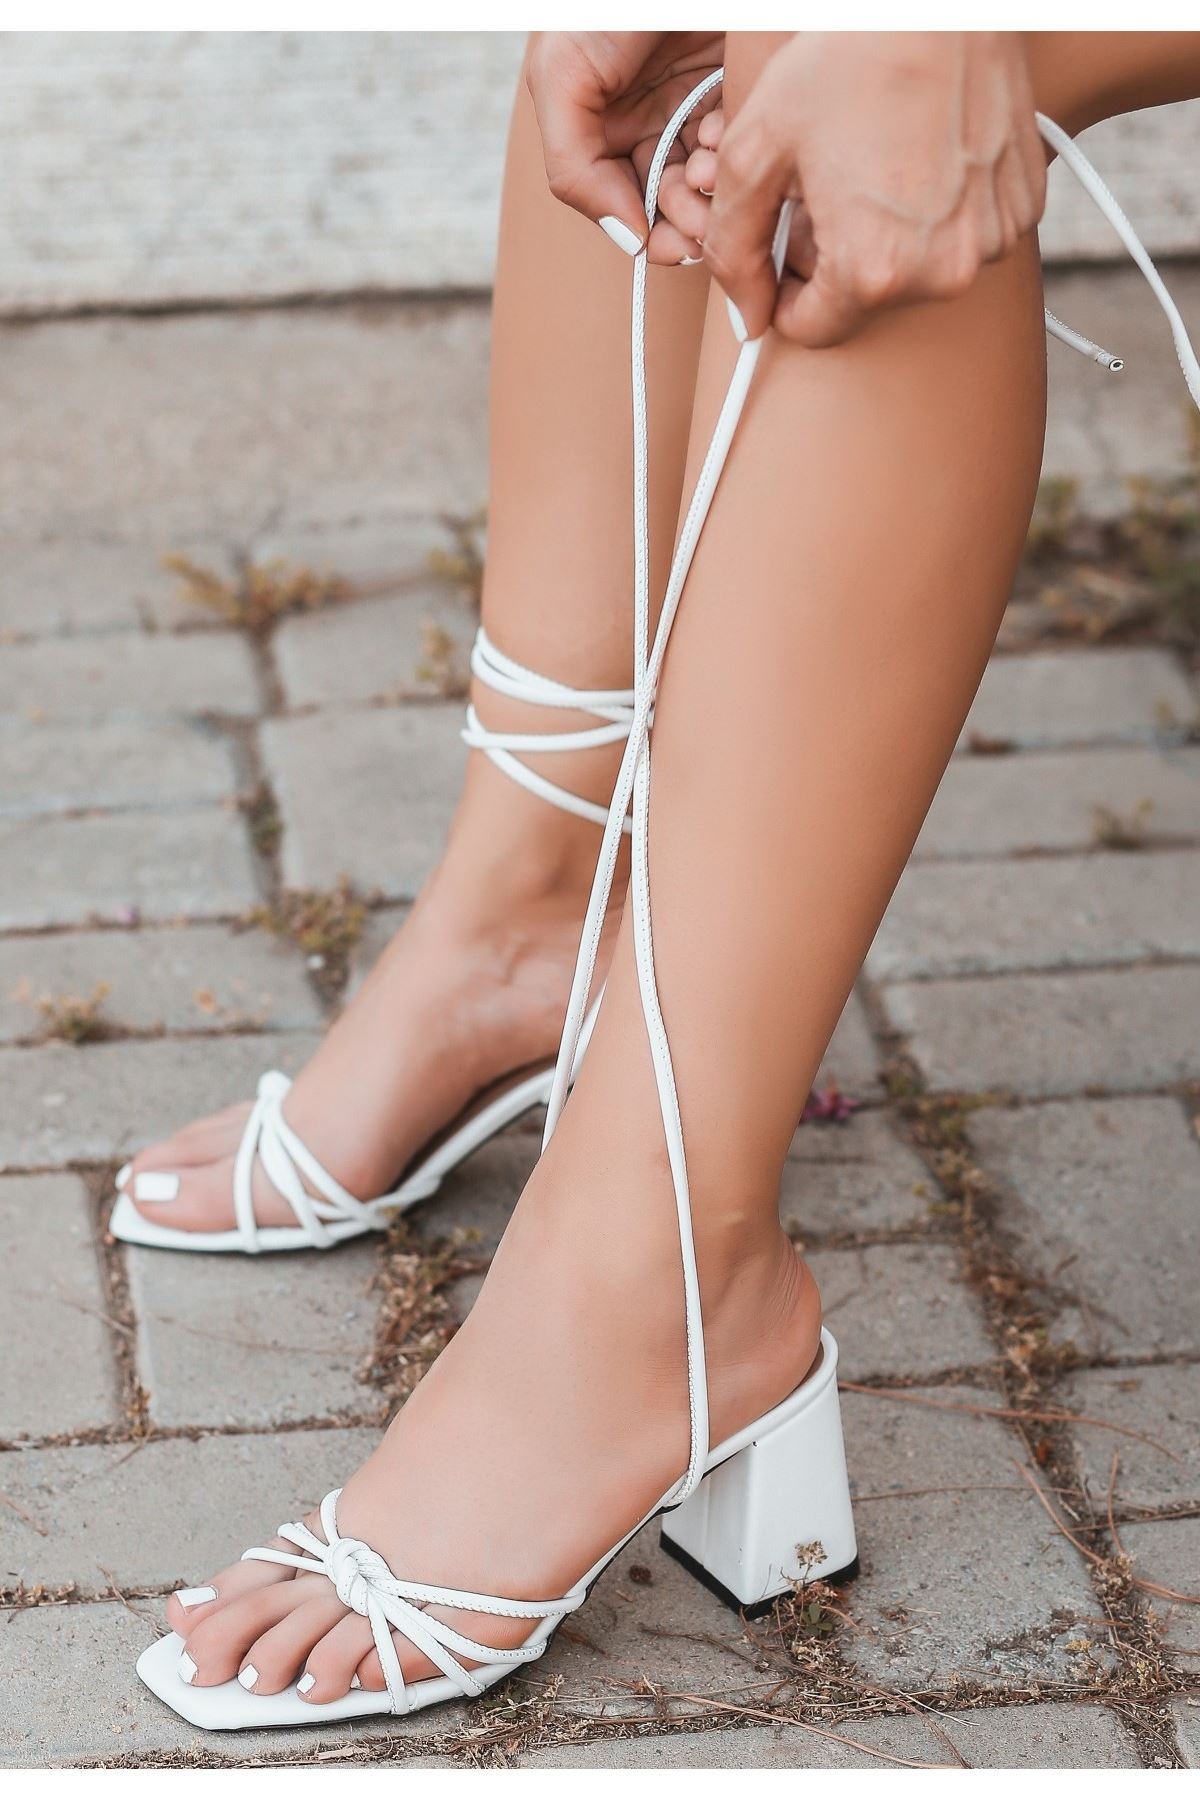 Jost Beyaz Cilt Topuklu Ayakkabı